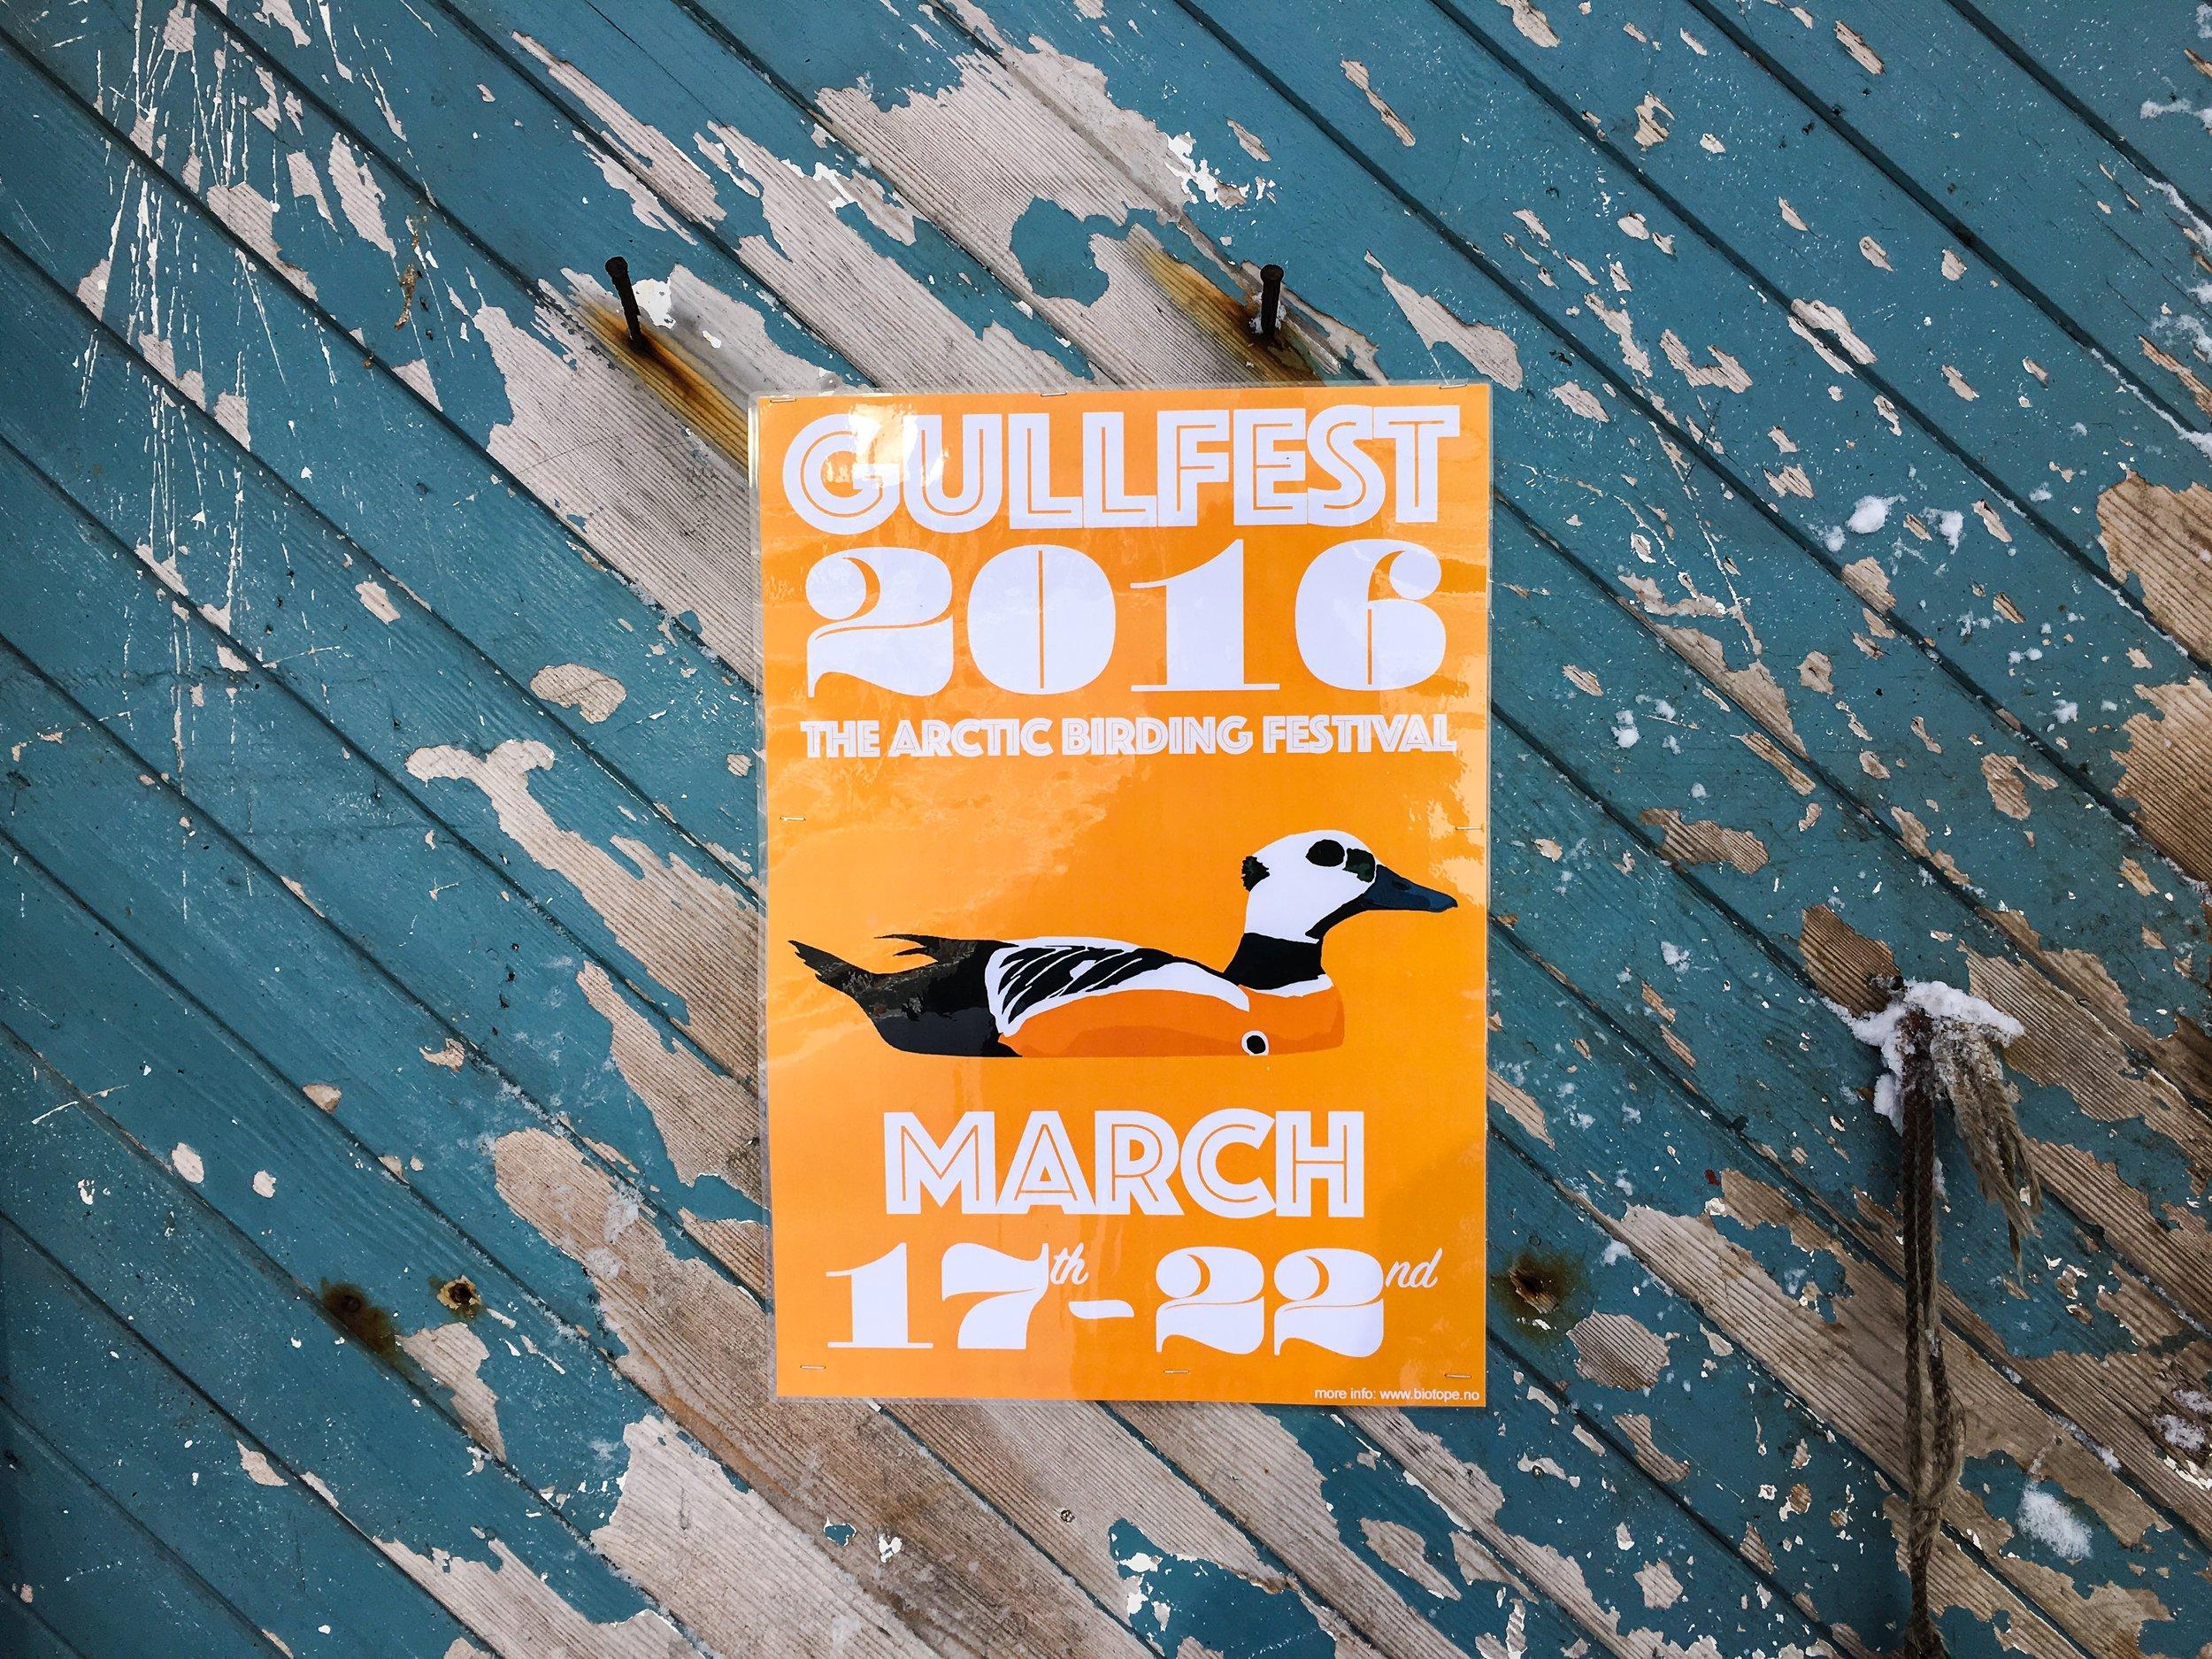 Gullfest 2016 poster on wall at østre molokrok IMG_2444 © Biotope.JPG